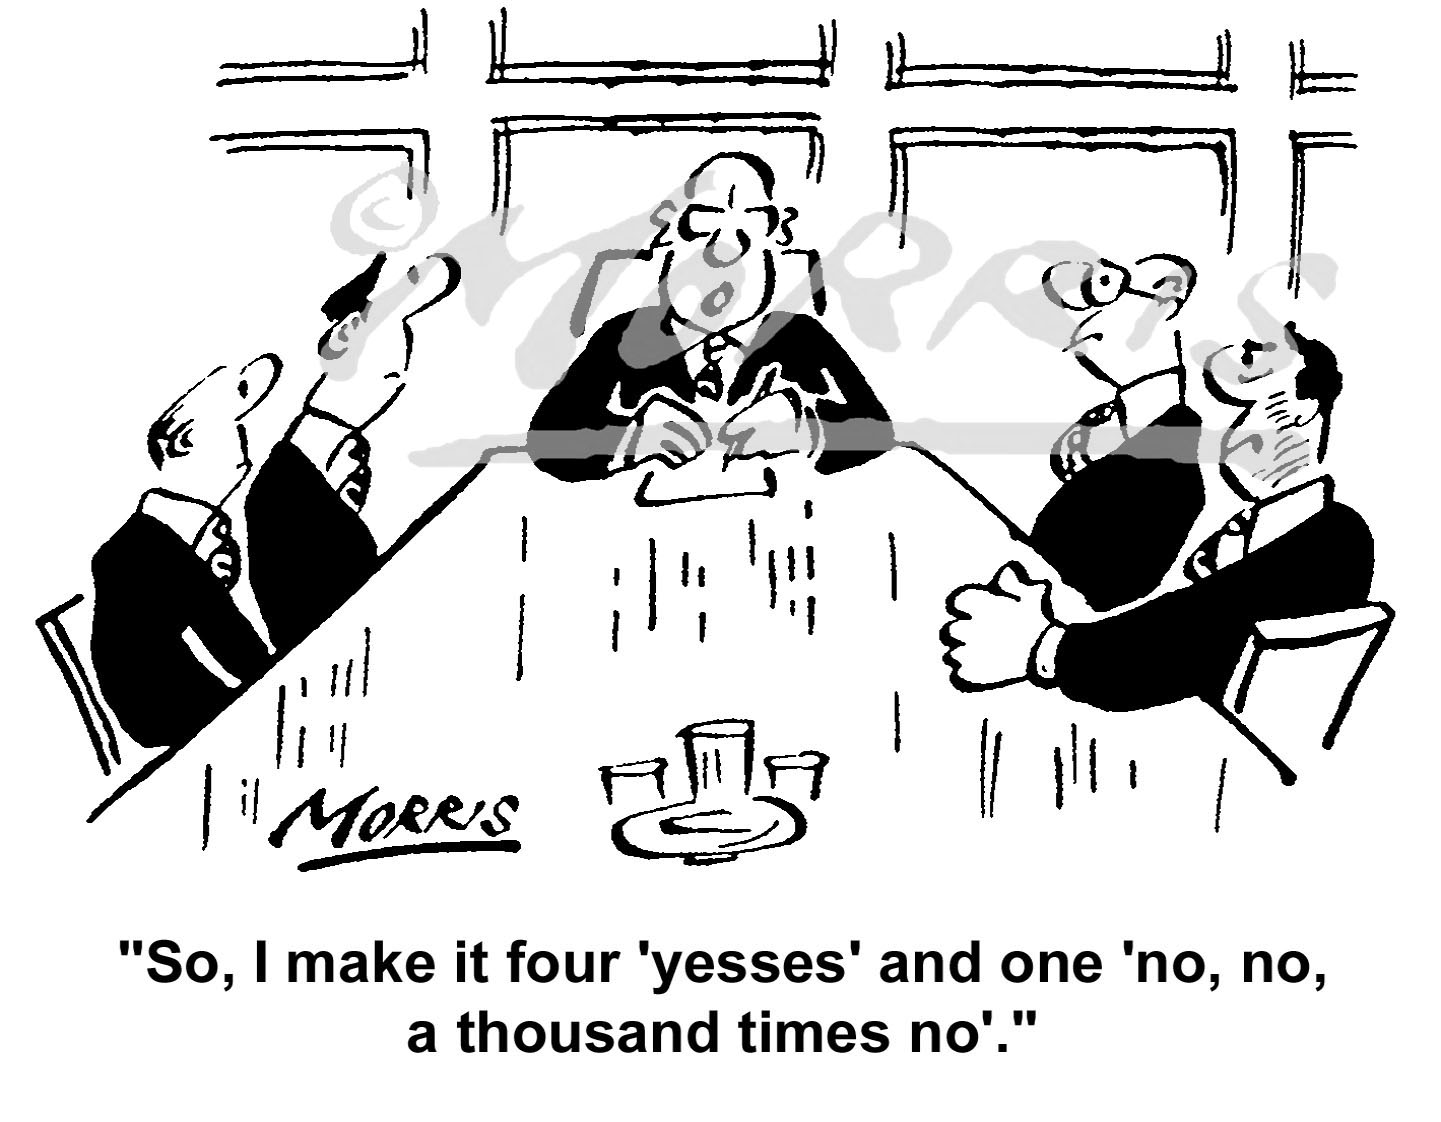 Boardroom meeting cartoon – Ref: 5069bw